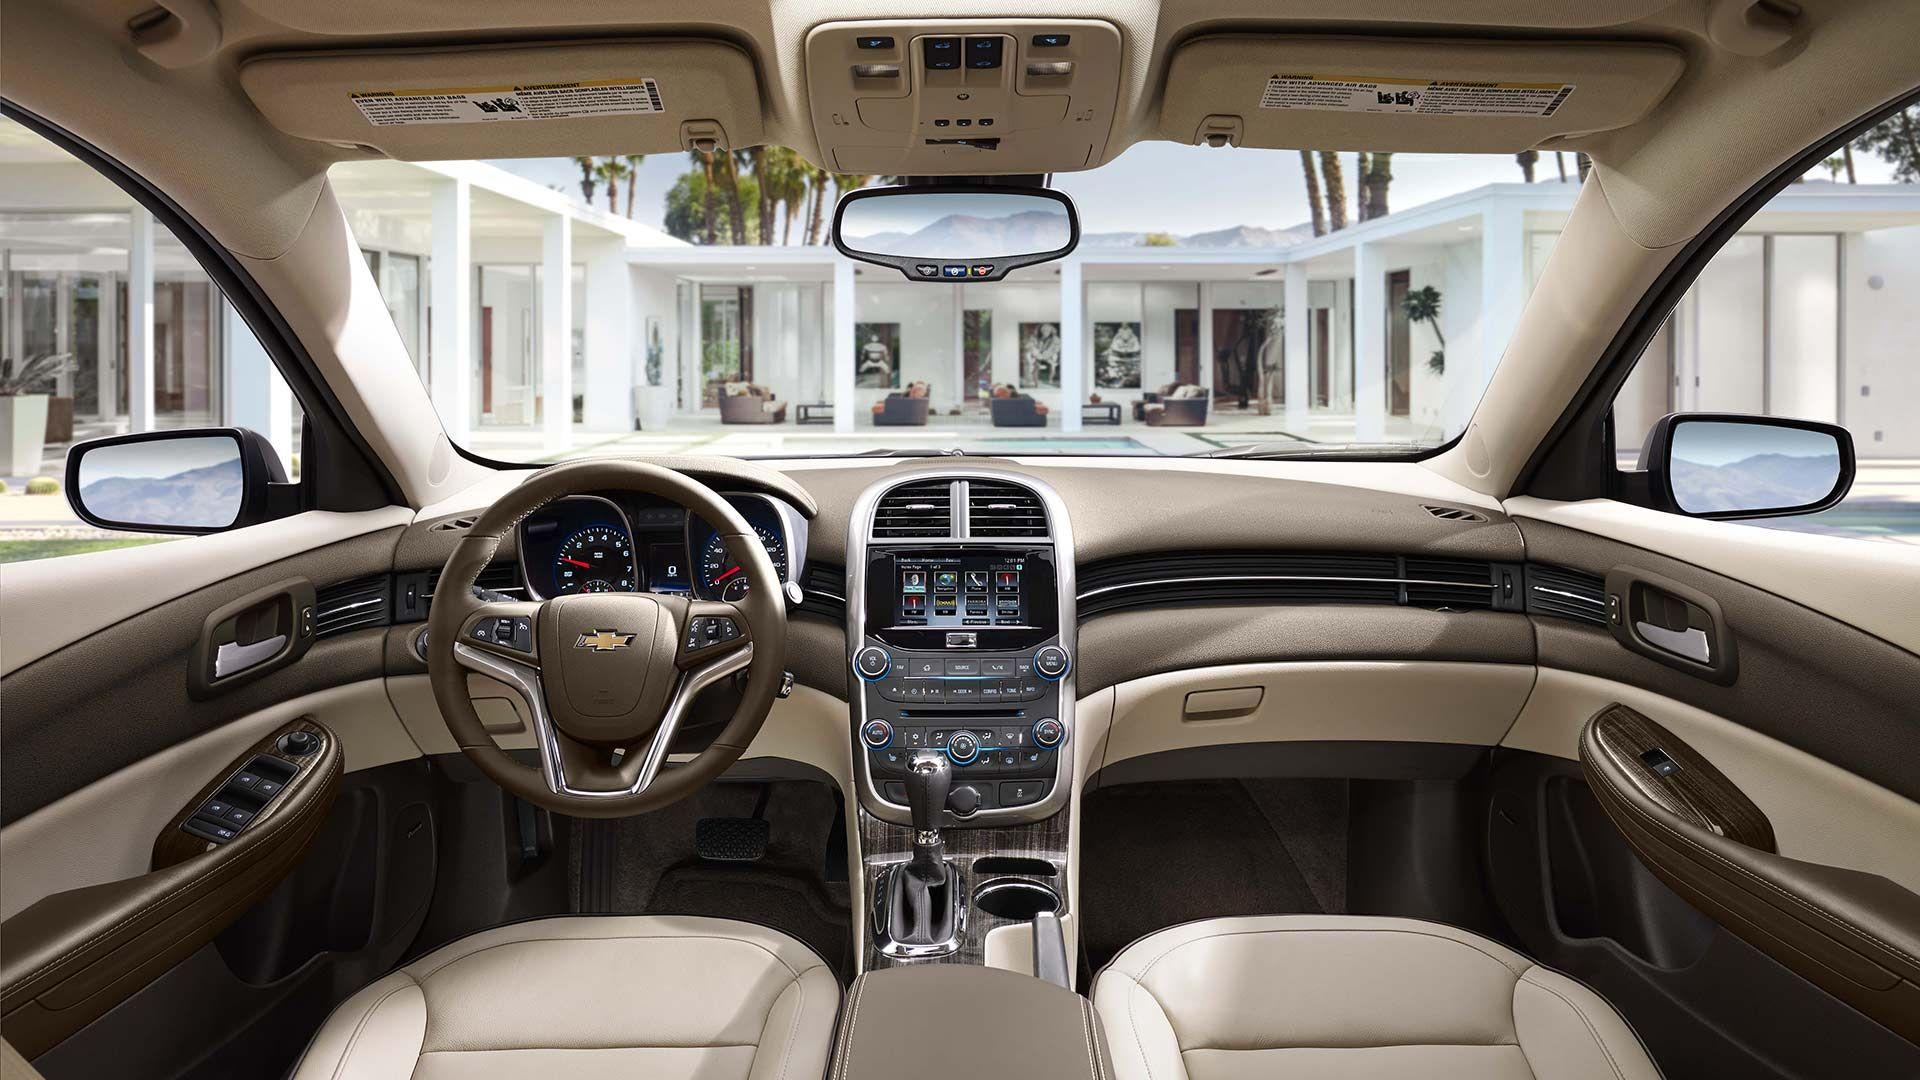 Malibu Limited Ltz Interior Photos Touchscreen Chevy Malibu Chevrolet Malibu Malibu